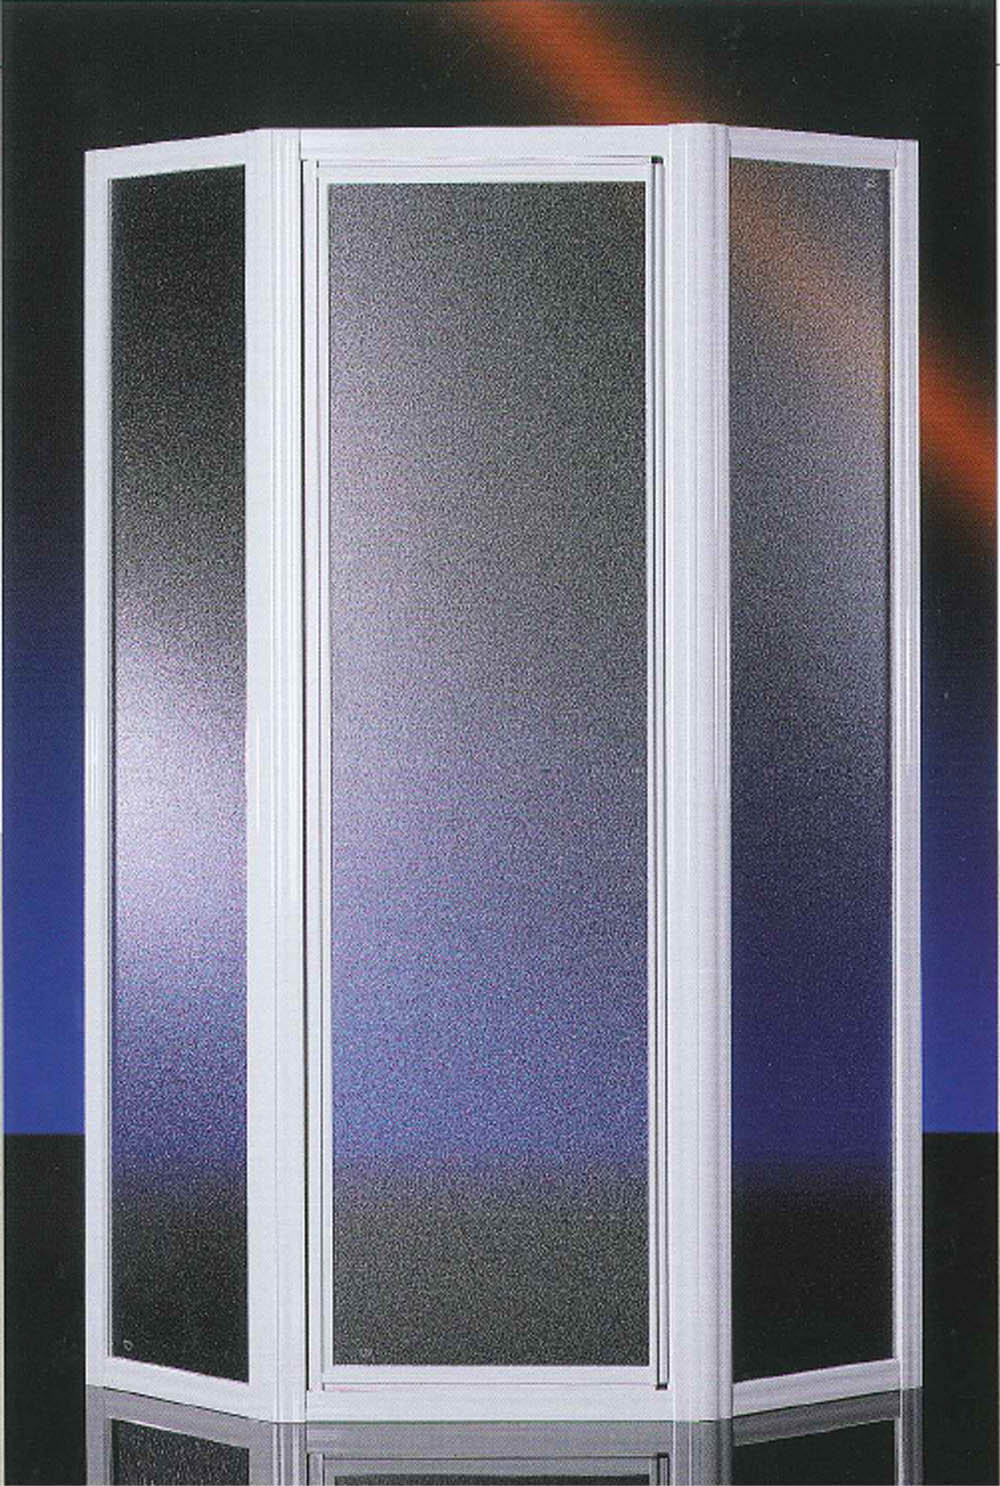 Box doccia pentagonale arredo bagno vetro temperato 3mm - Box doccia pentagonale ...